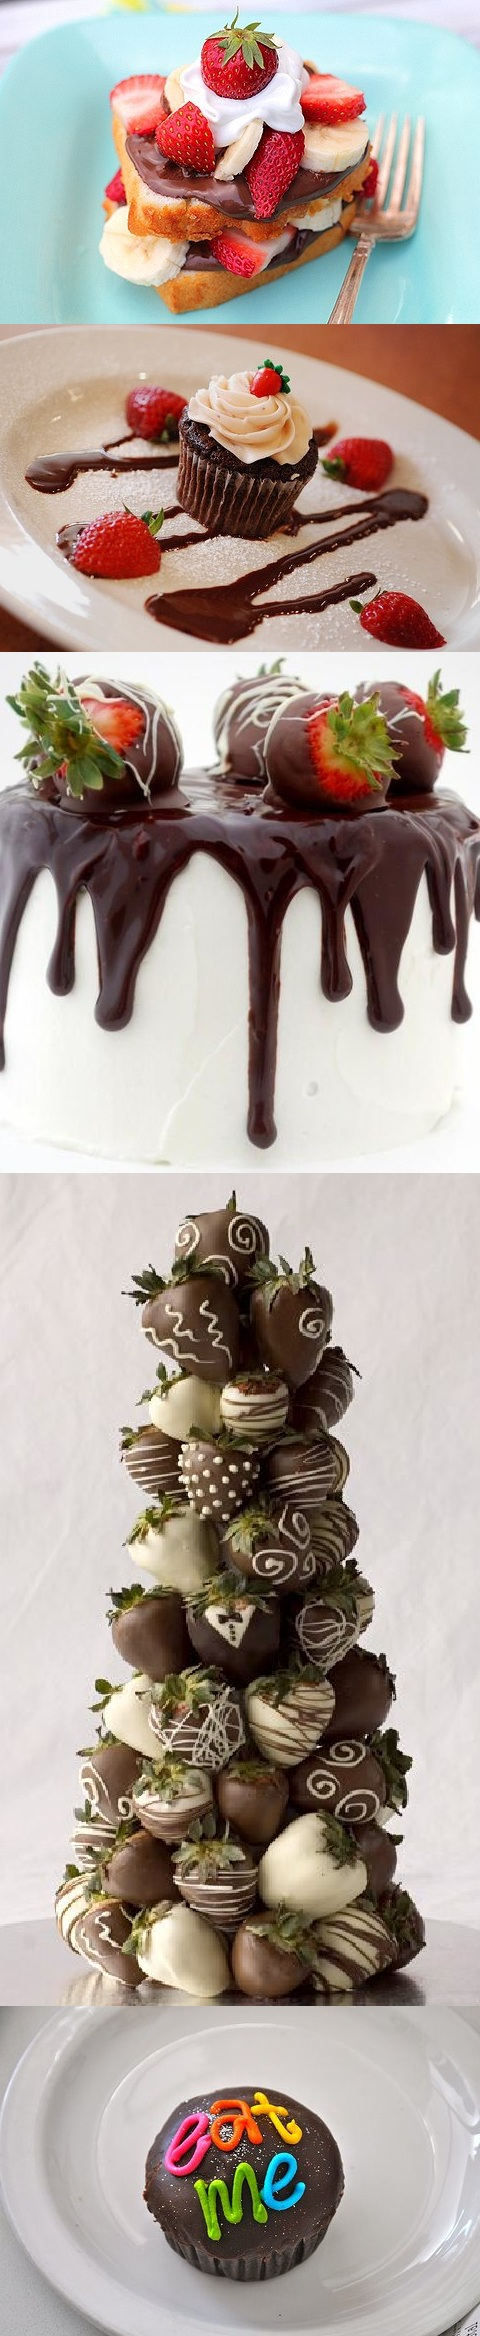 czekolada <3